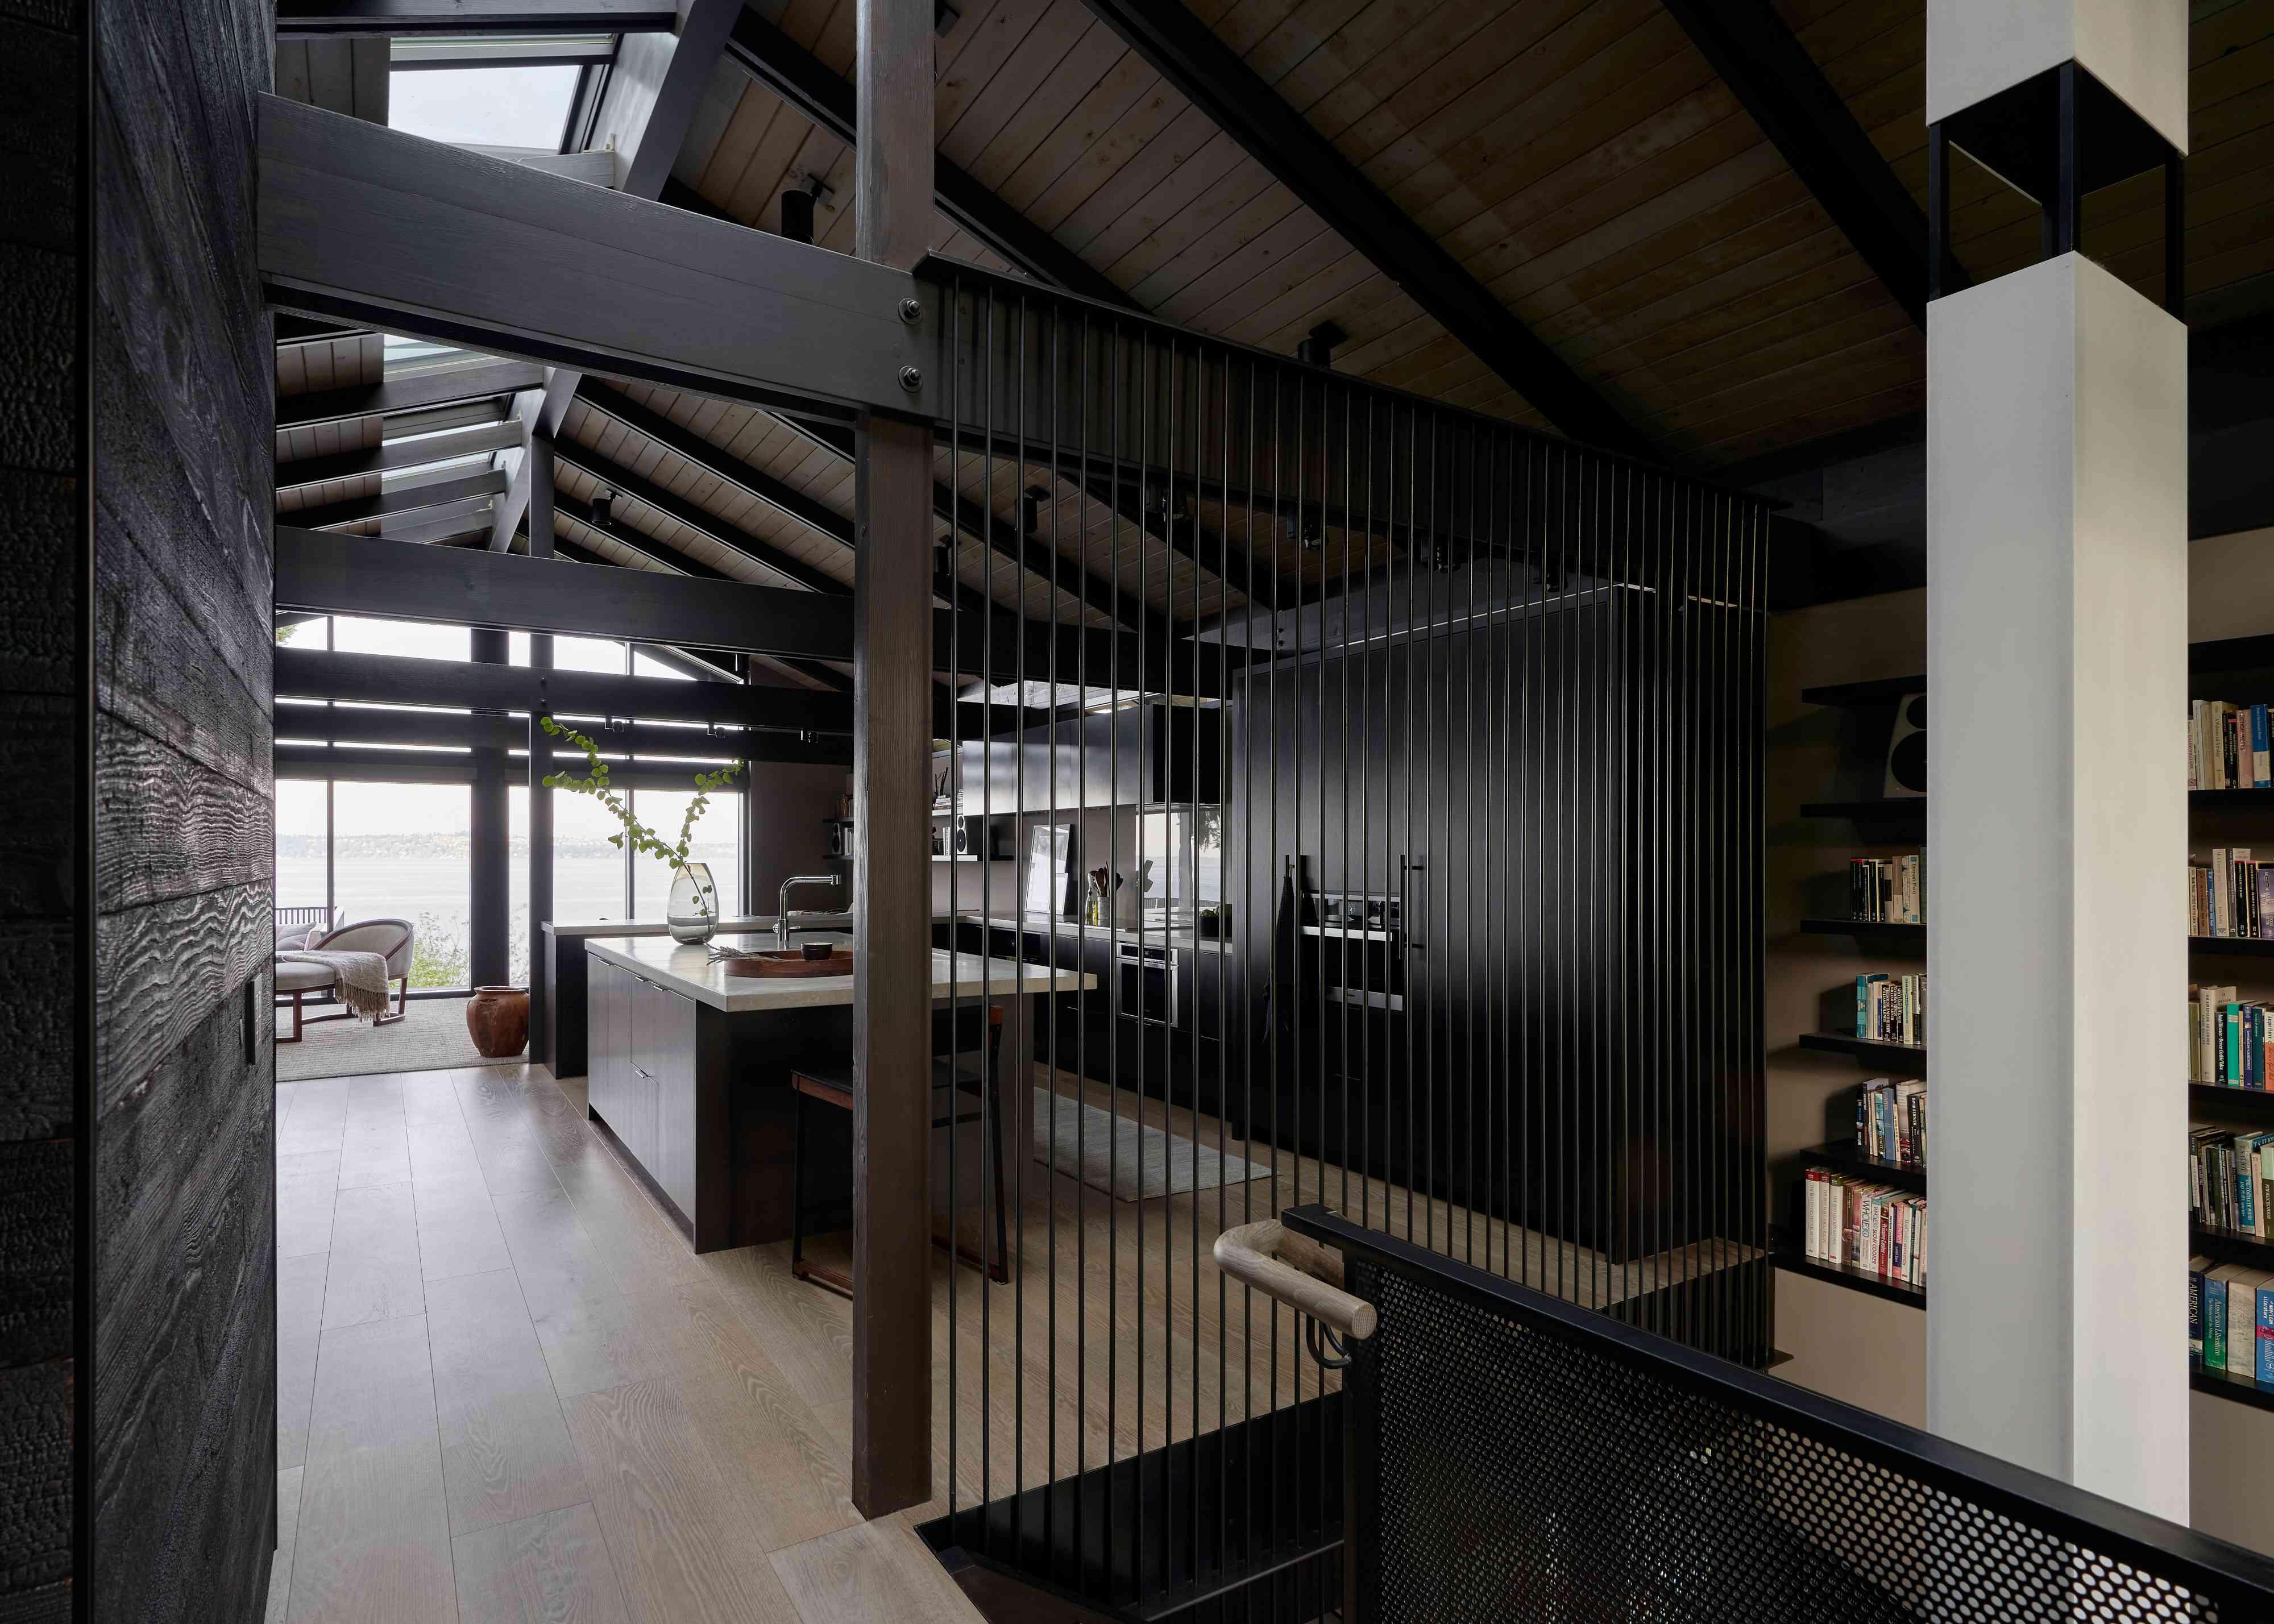 Interior modernist design